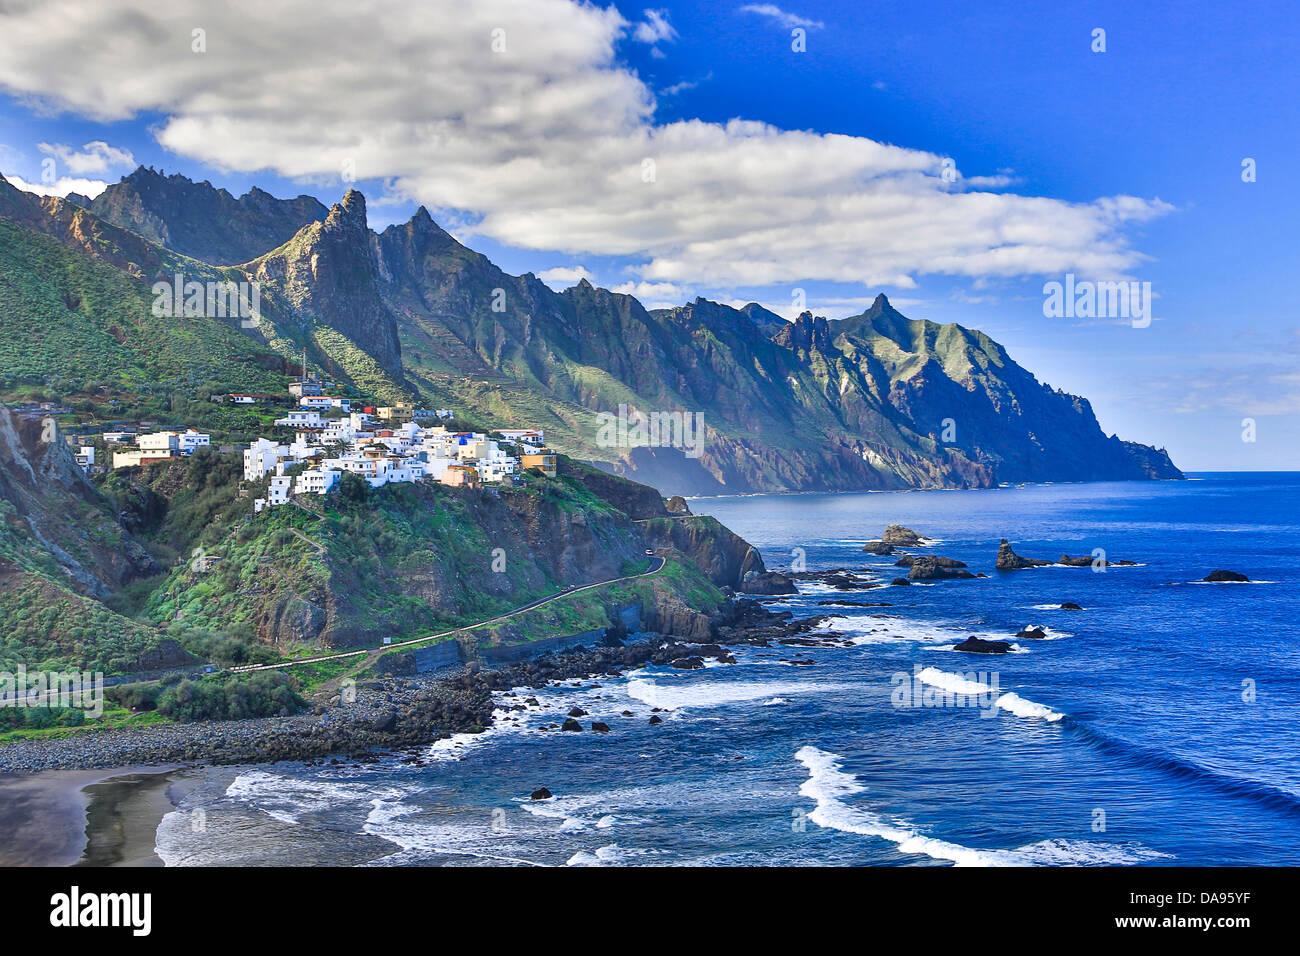 Almáciga, Kanarische Inseln, Kanaren, Taganana, Taganana Küste, auf der Insel Teneriffa, Teneriffa, Teneriffa, Stockbild